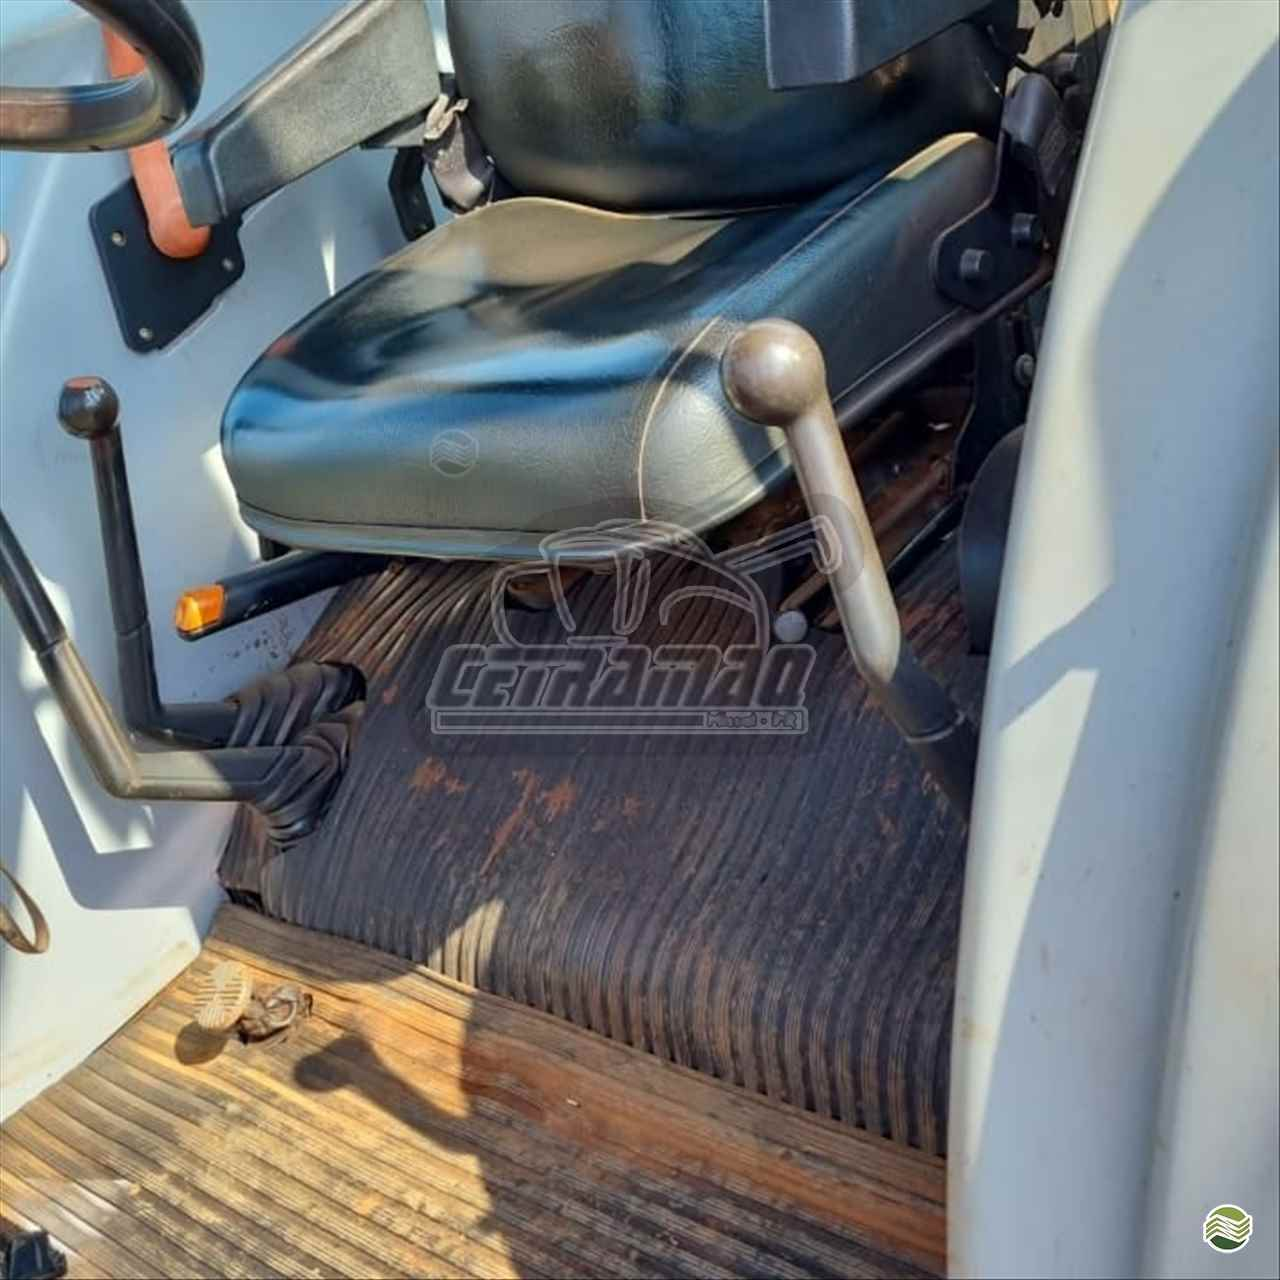 TRATOR NEW HOLLAND NEW TL 85 Tração 4x4 Cetramaq Máquinas MISSAL PARANÁ PR